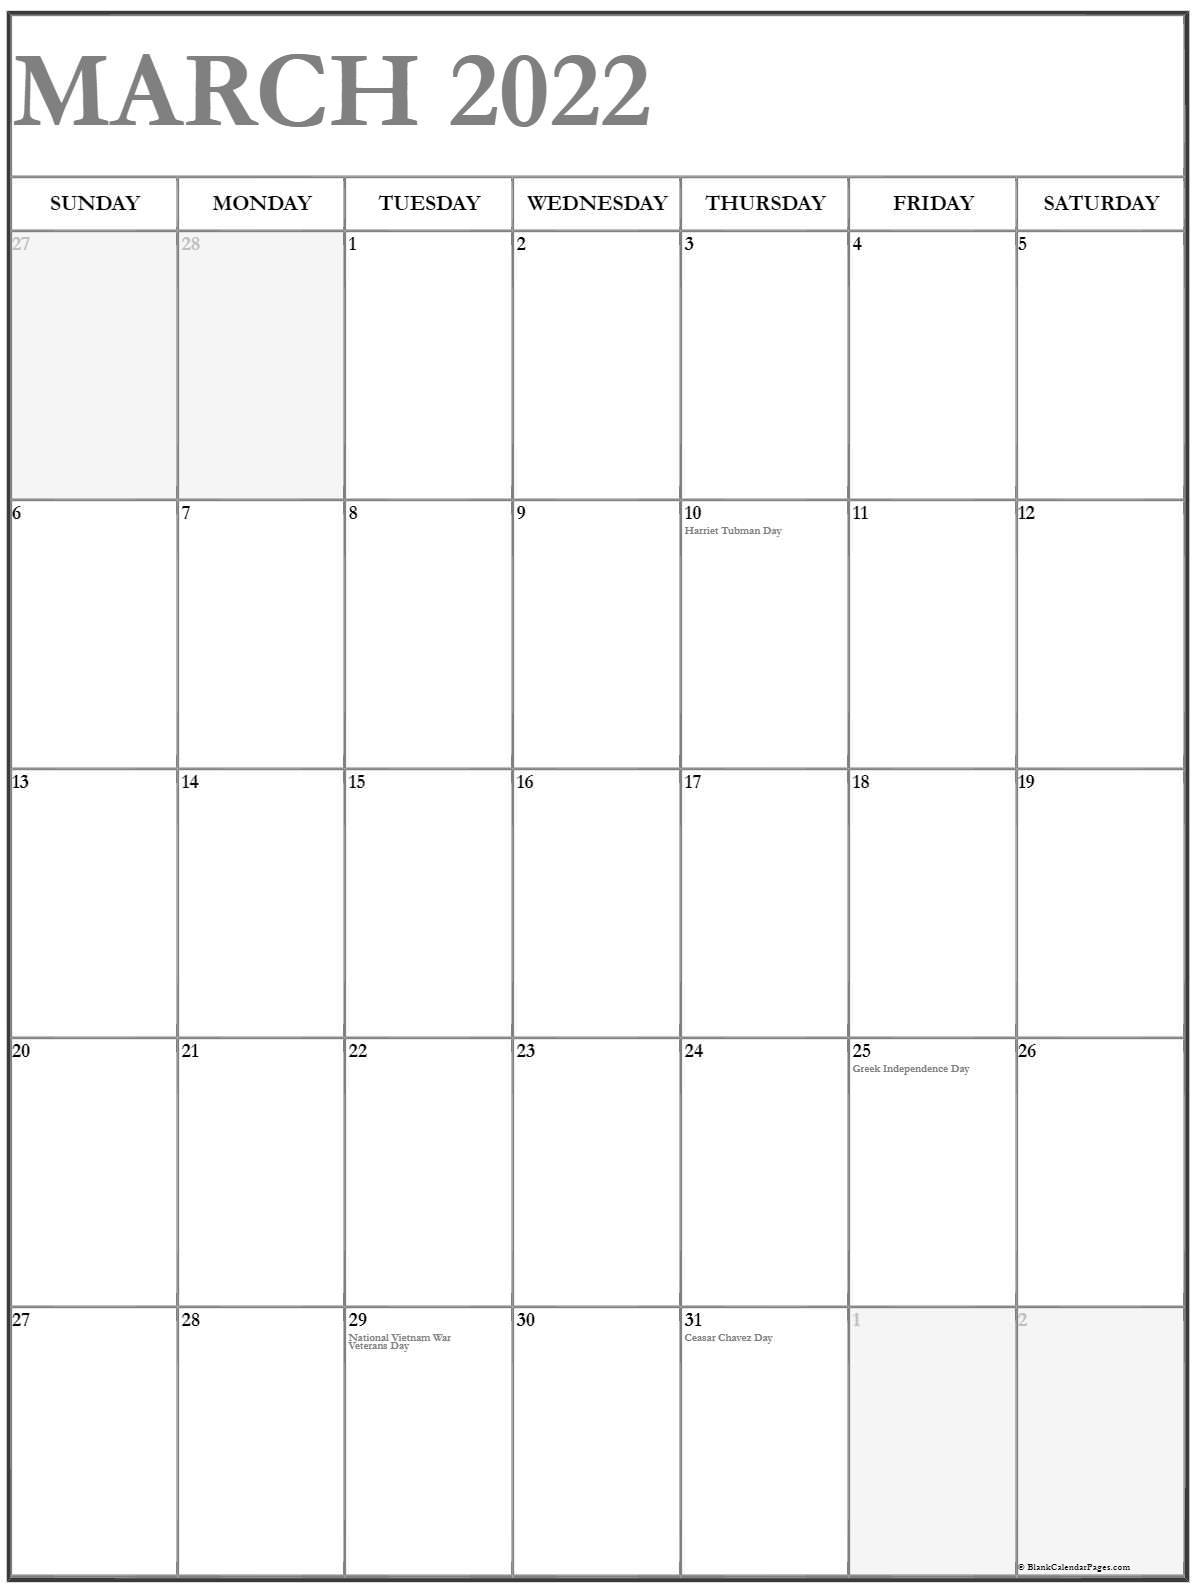 March 2022 Vertical Calendar | Portrait Within February March 2022 Calendar